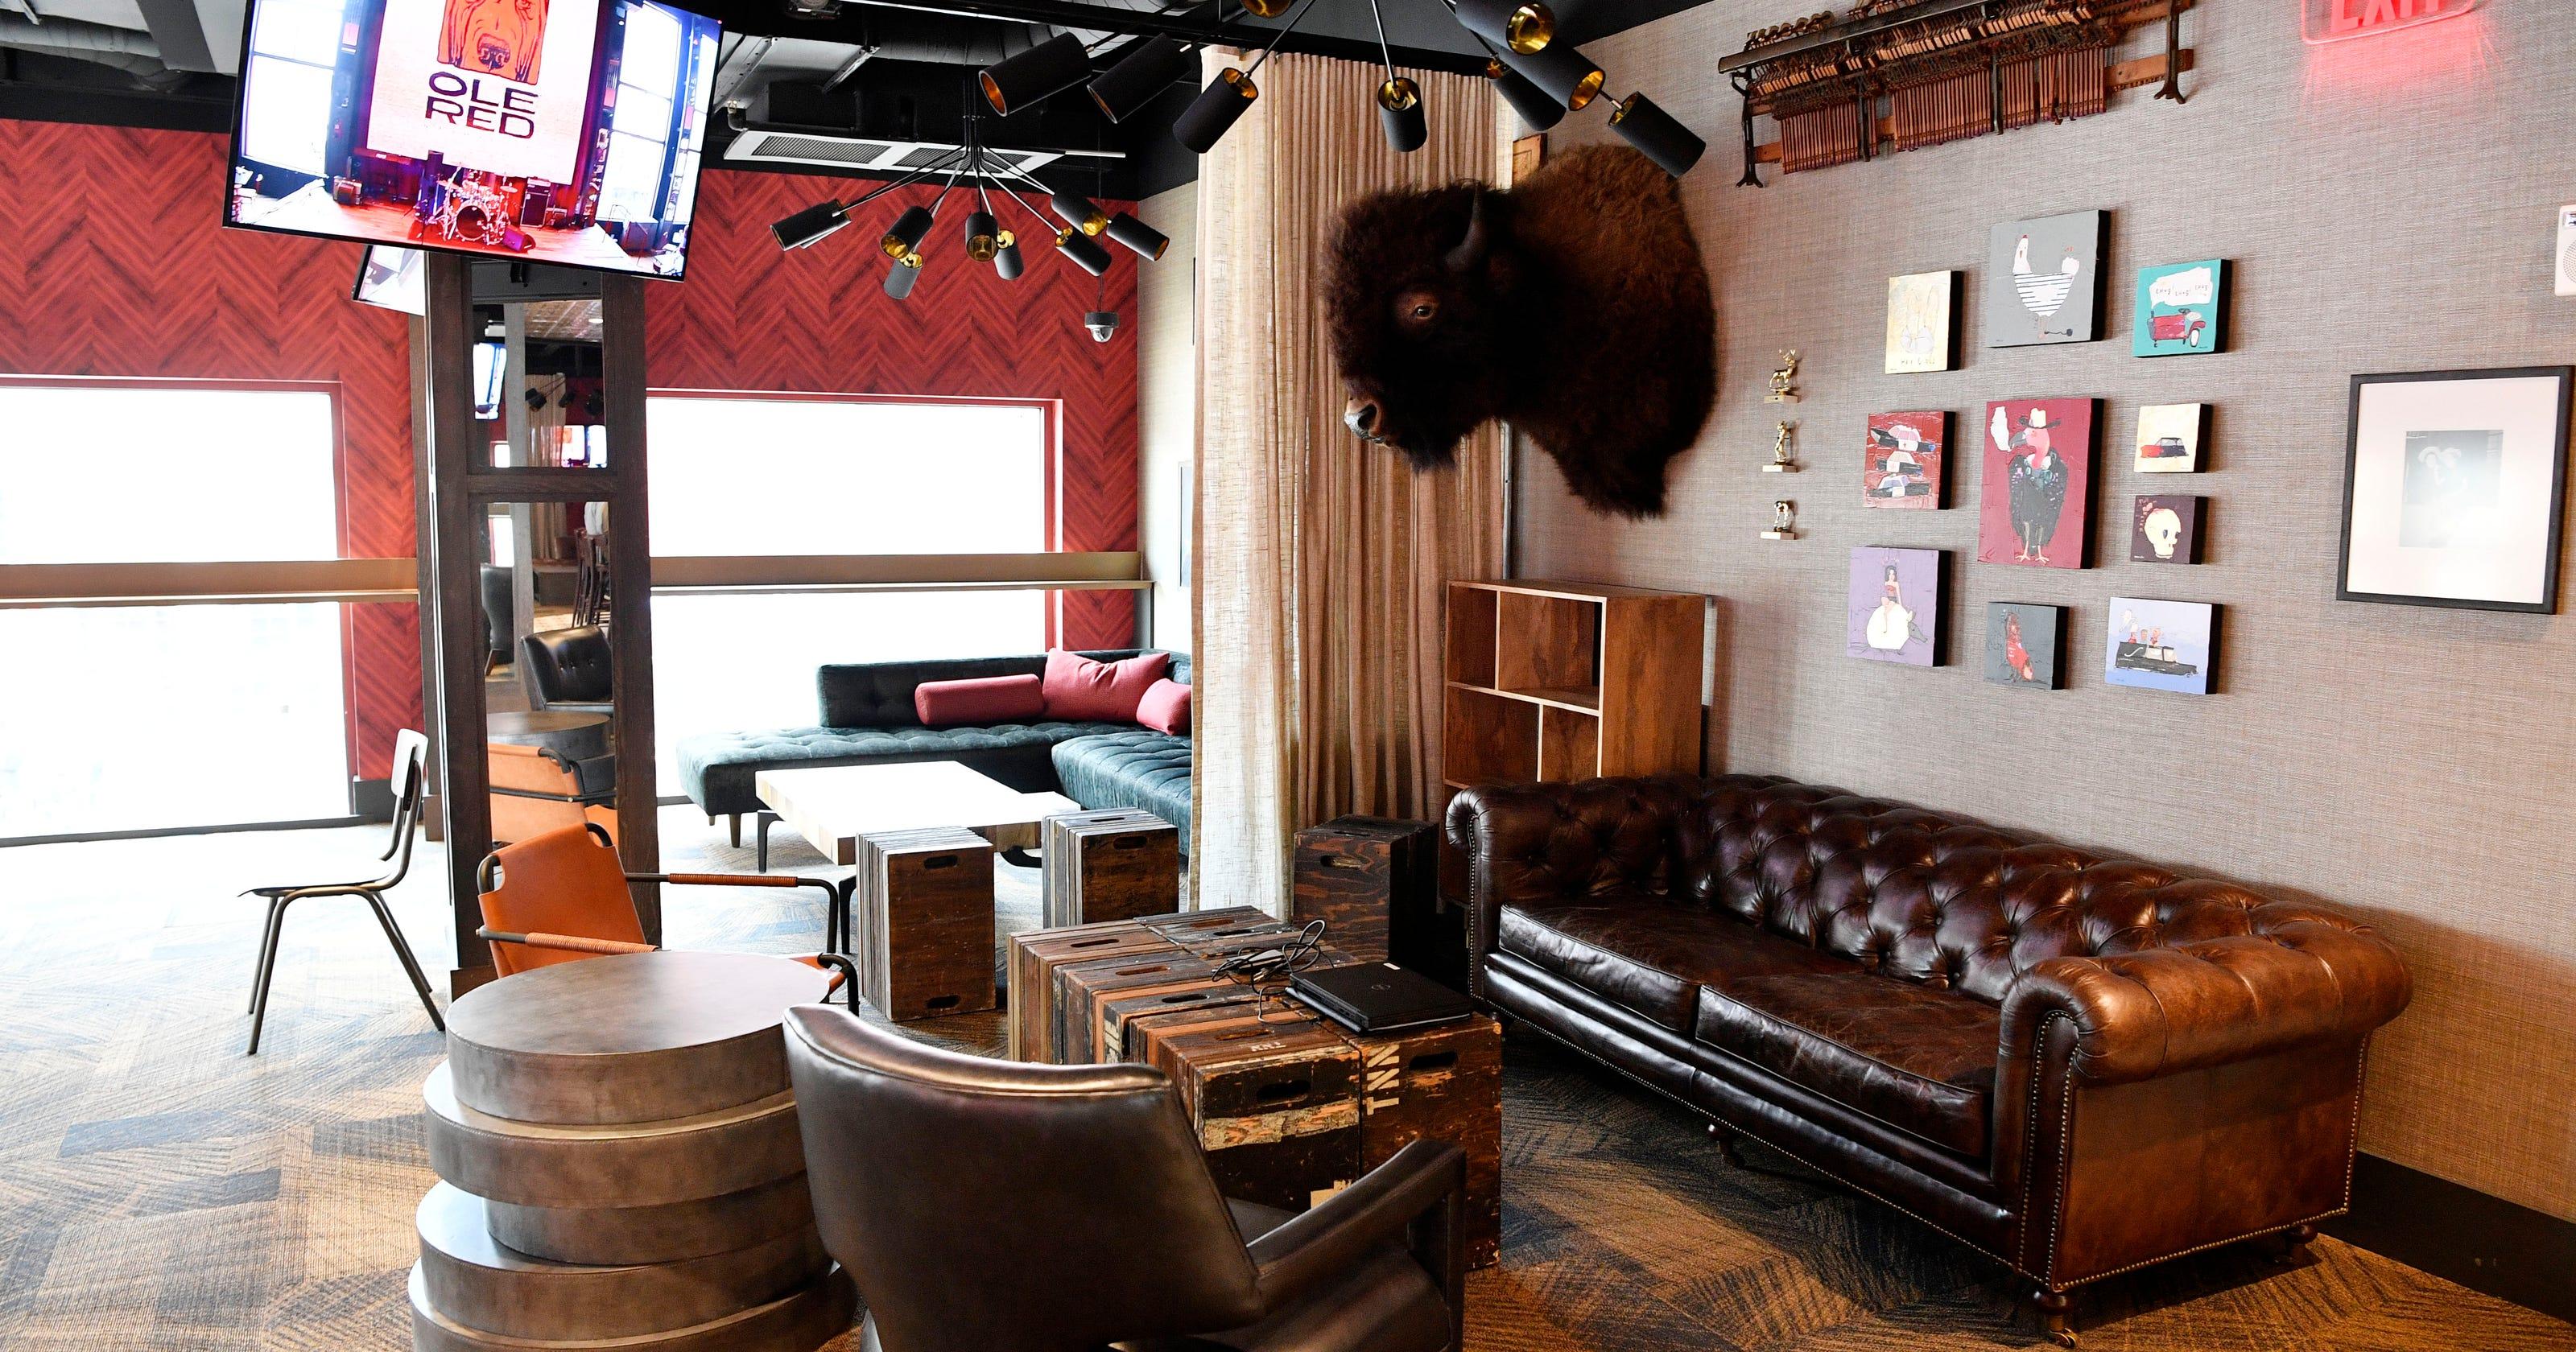 Ole Red Nashville: Blake Shelton's bar offers upscale take on honky tonk